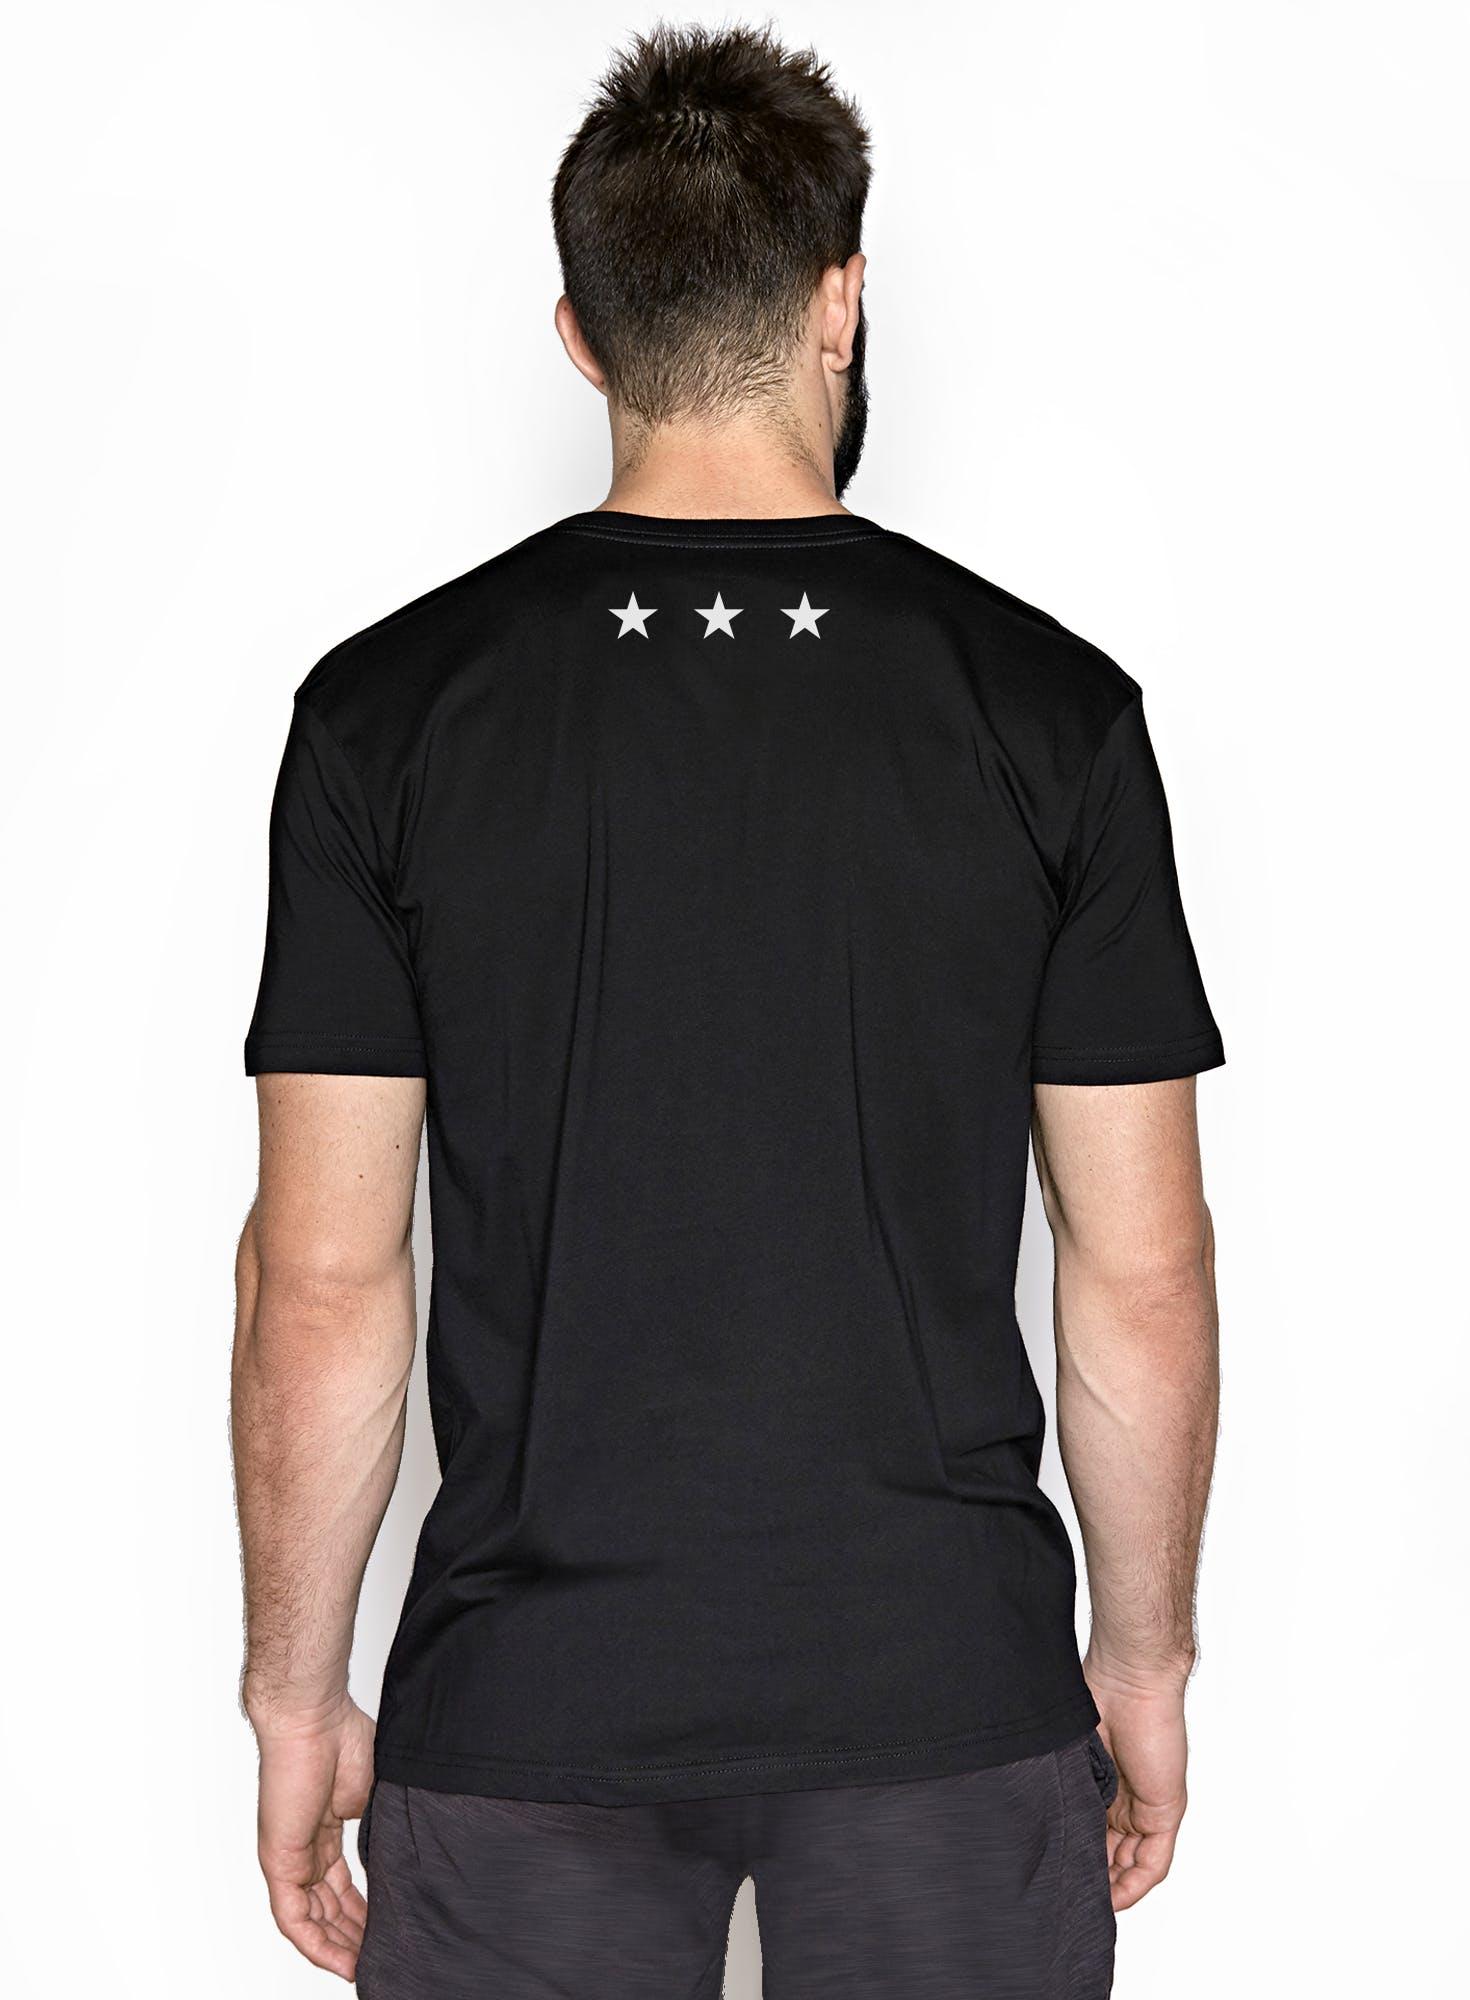 Pennant Organic Cotton T-Shirt Bonus Image